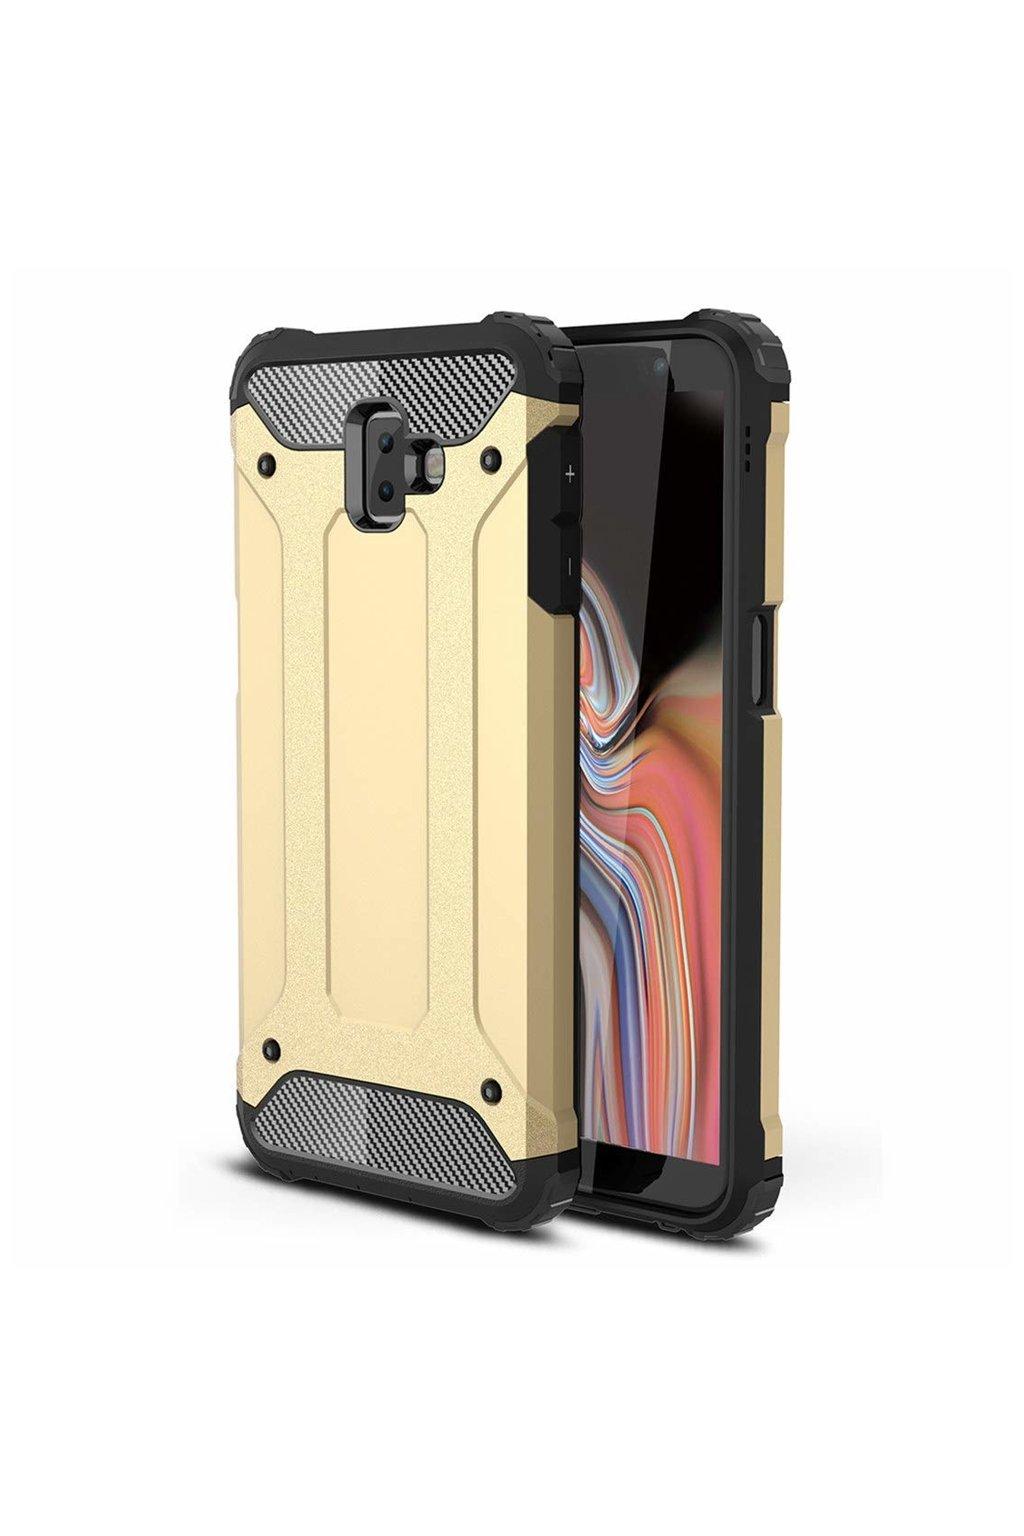 eng pl Hybrid Armor Case Tough Rugged Cover for Samsung Galaxy J6 Plus 2018 J610 golden 45443 1